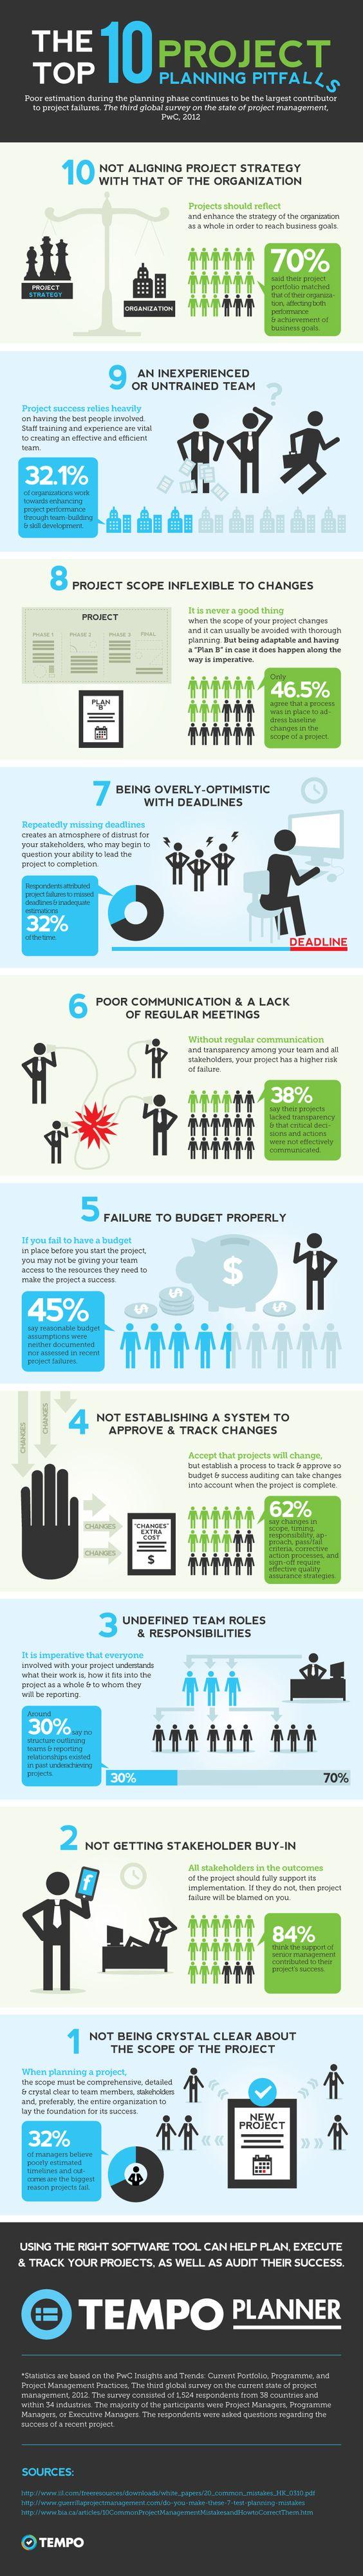 10 Impressive Project Management Planning Tips [Infographic] -- [Project Management] [Best-practice] #DigitalE45DK